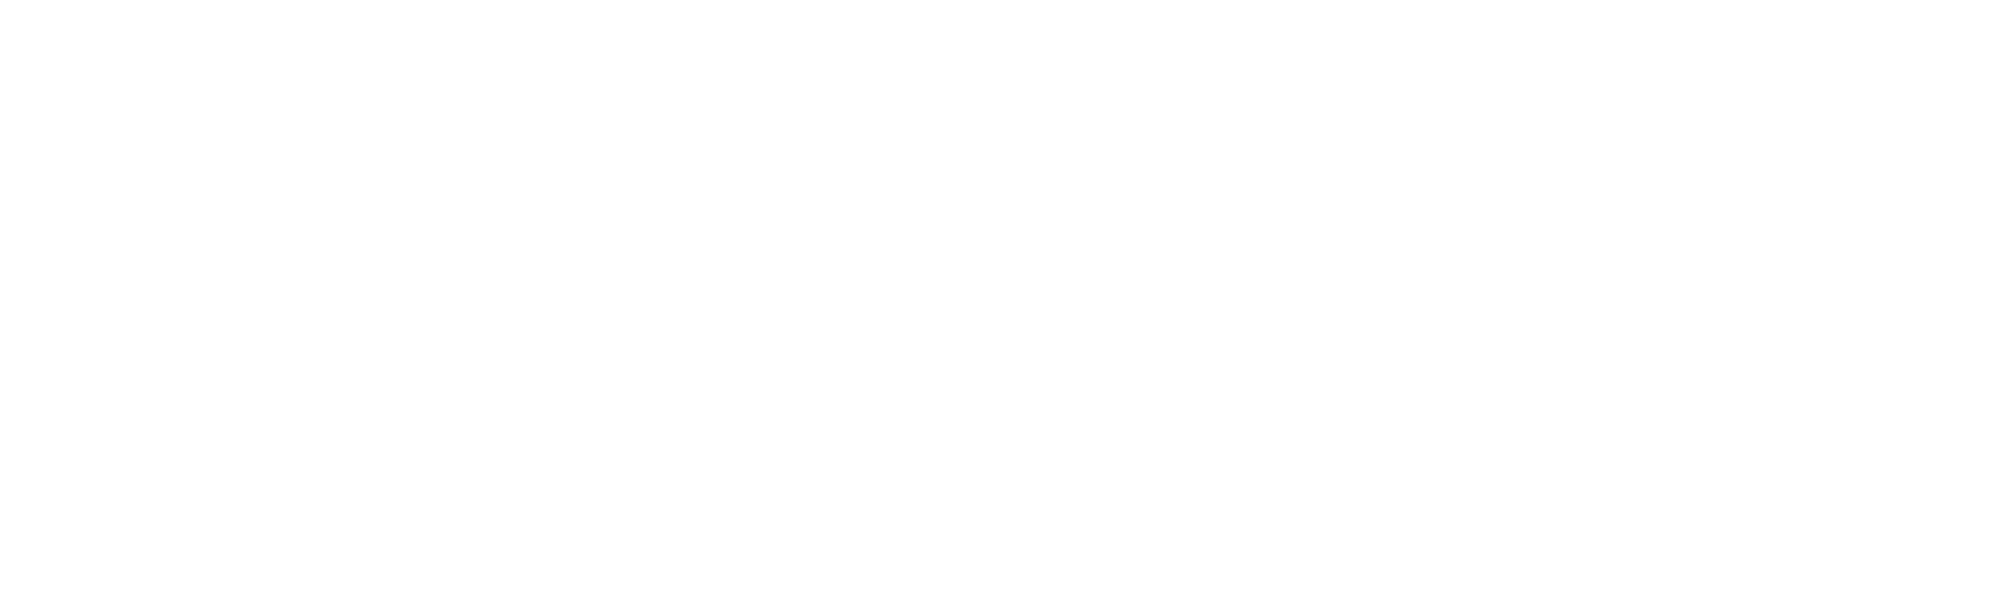 Rain Jaudon - Biloxi and New Orleans Professional Musician